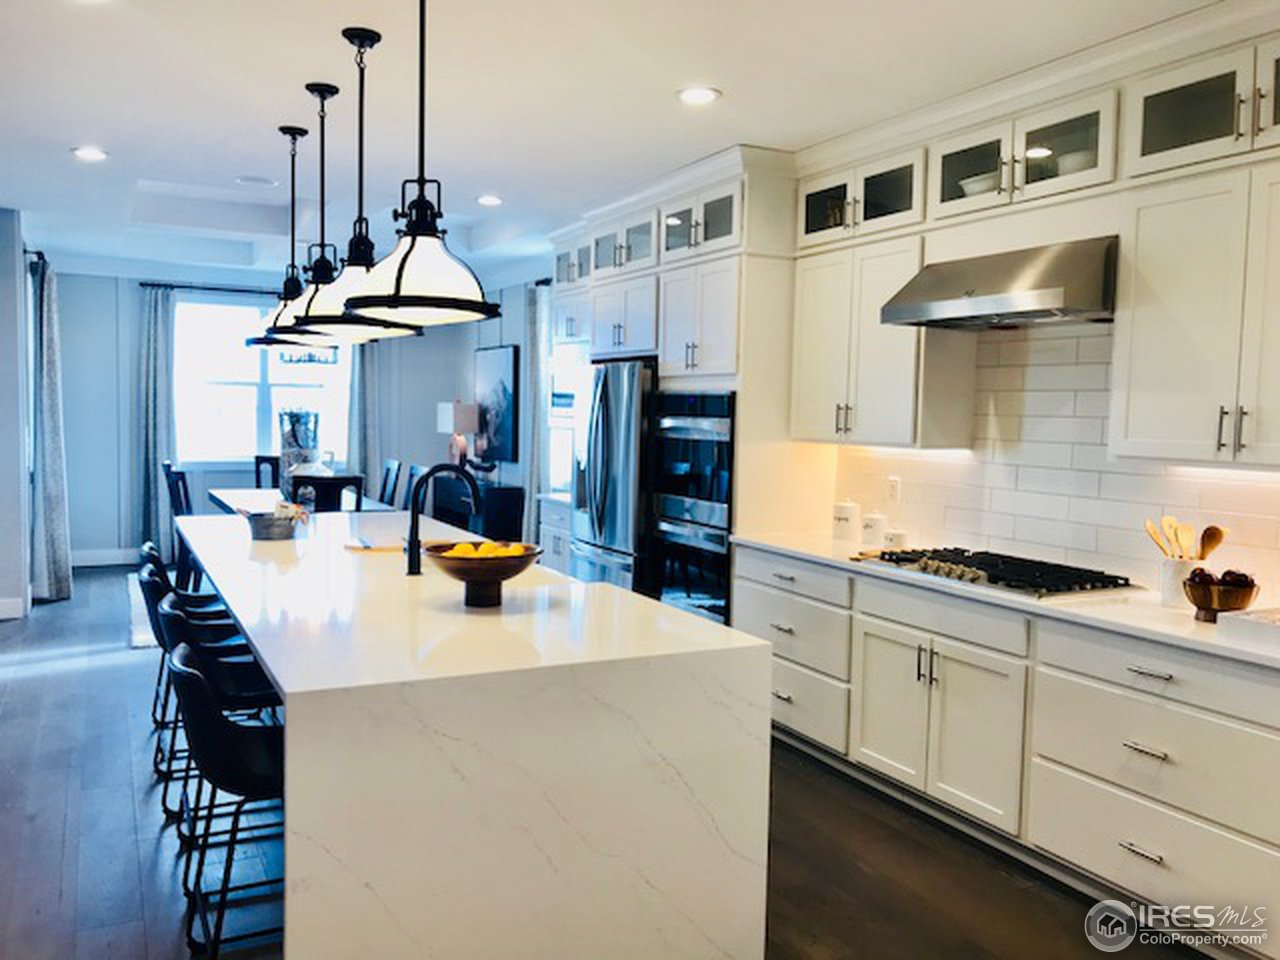 Berthoud Colorado Homes for Sale